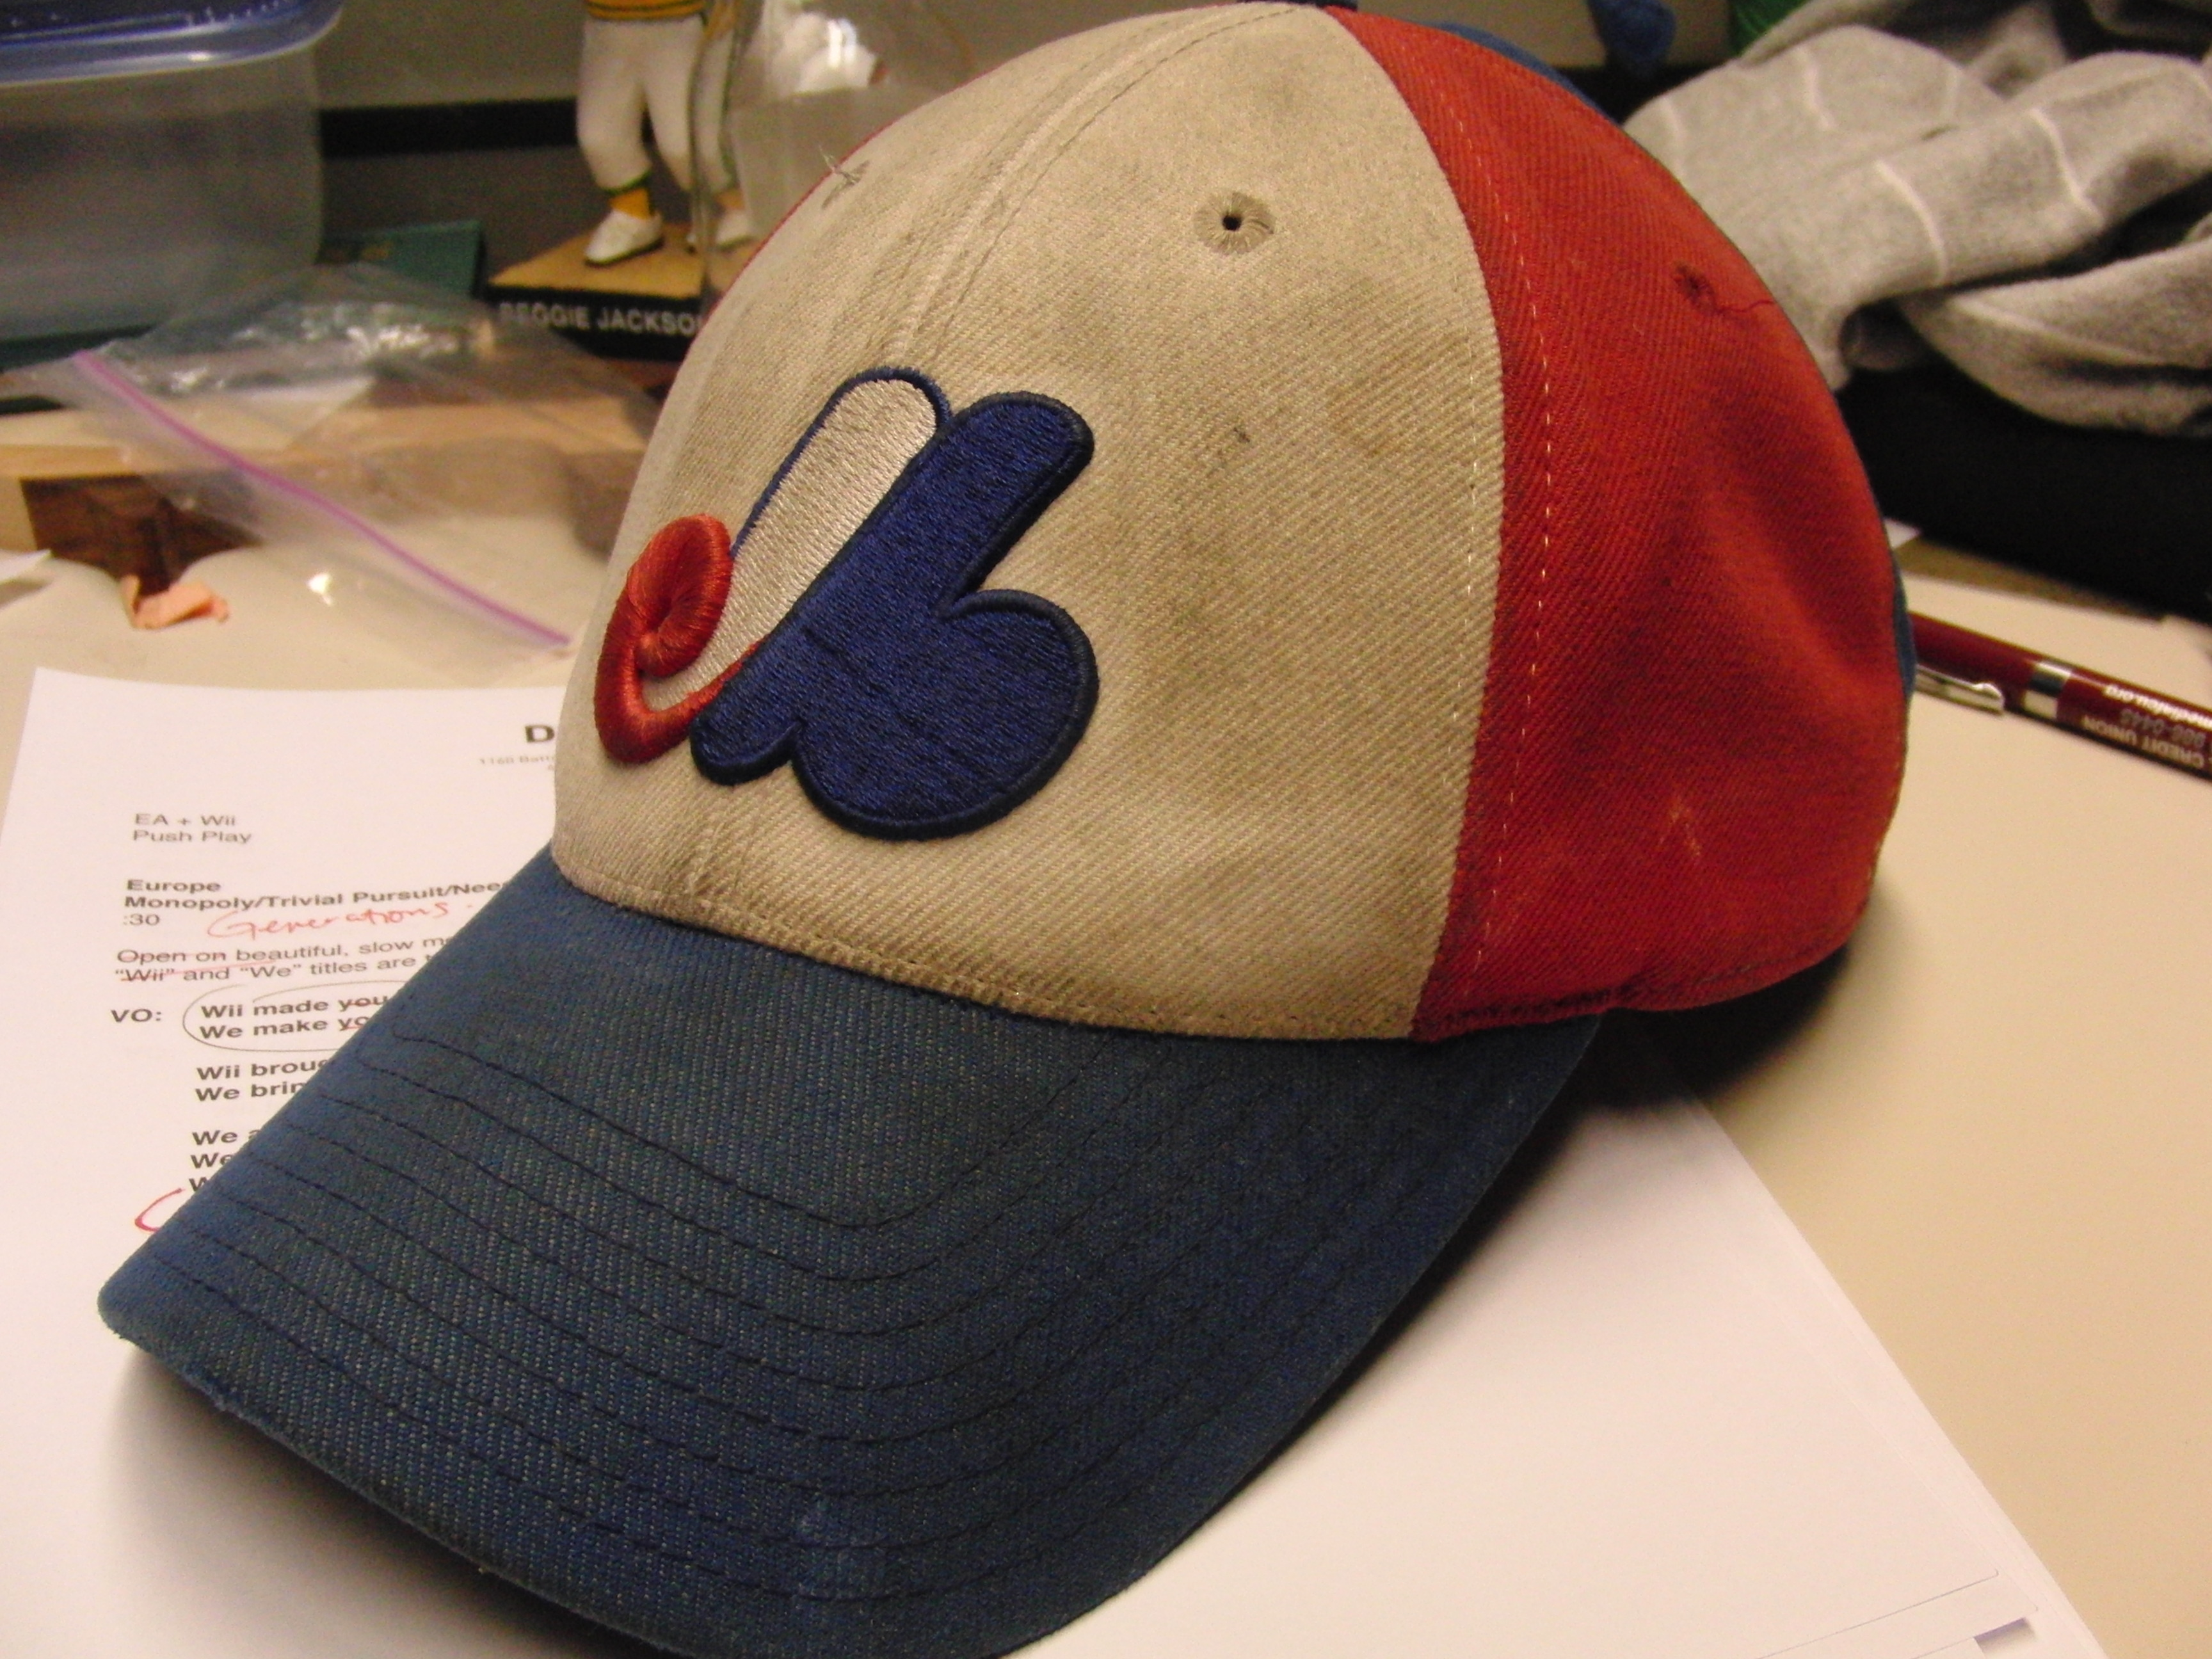 File Montreal Expos baseball cap 1969-1991.jpg - Wikimedia Commons 7aa22db9bef